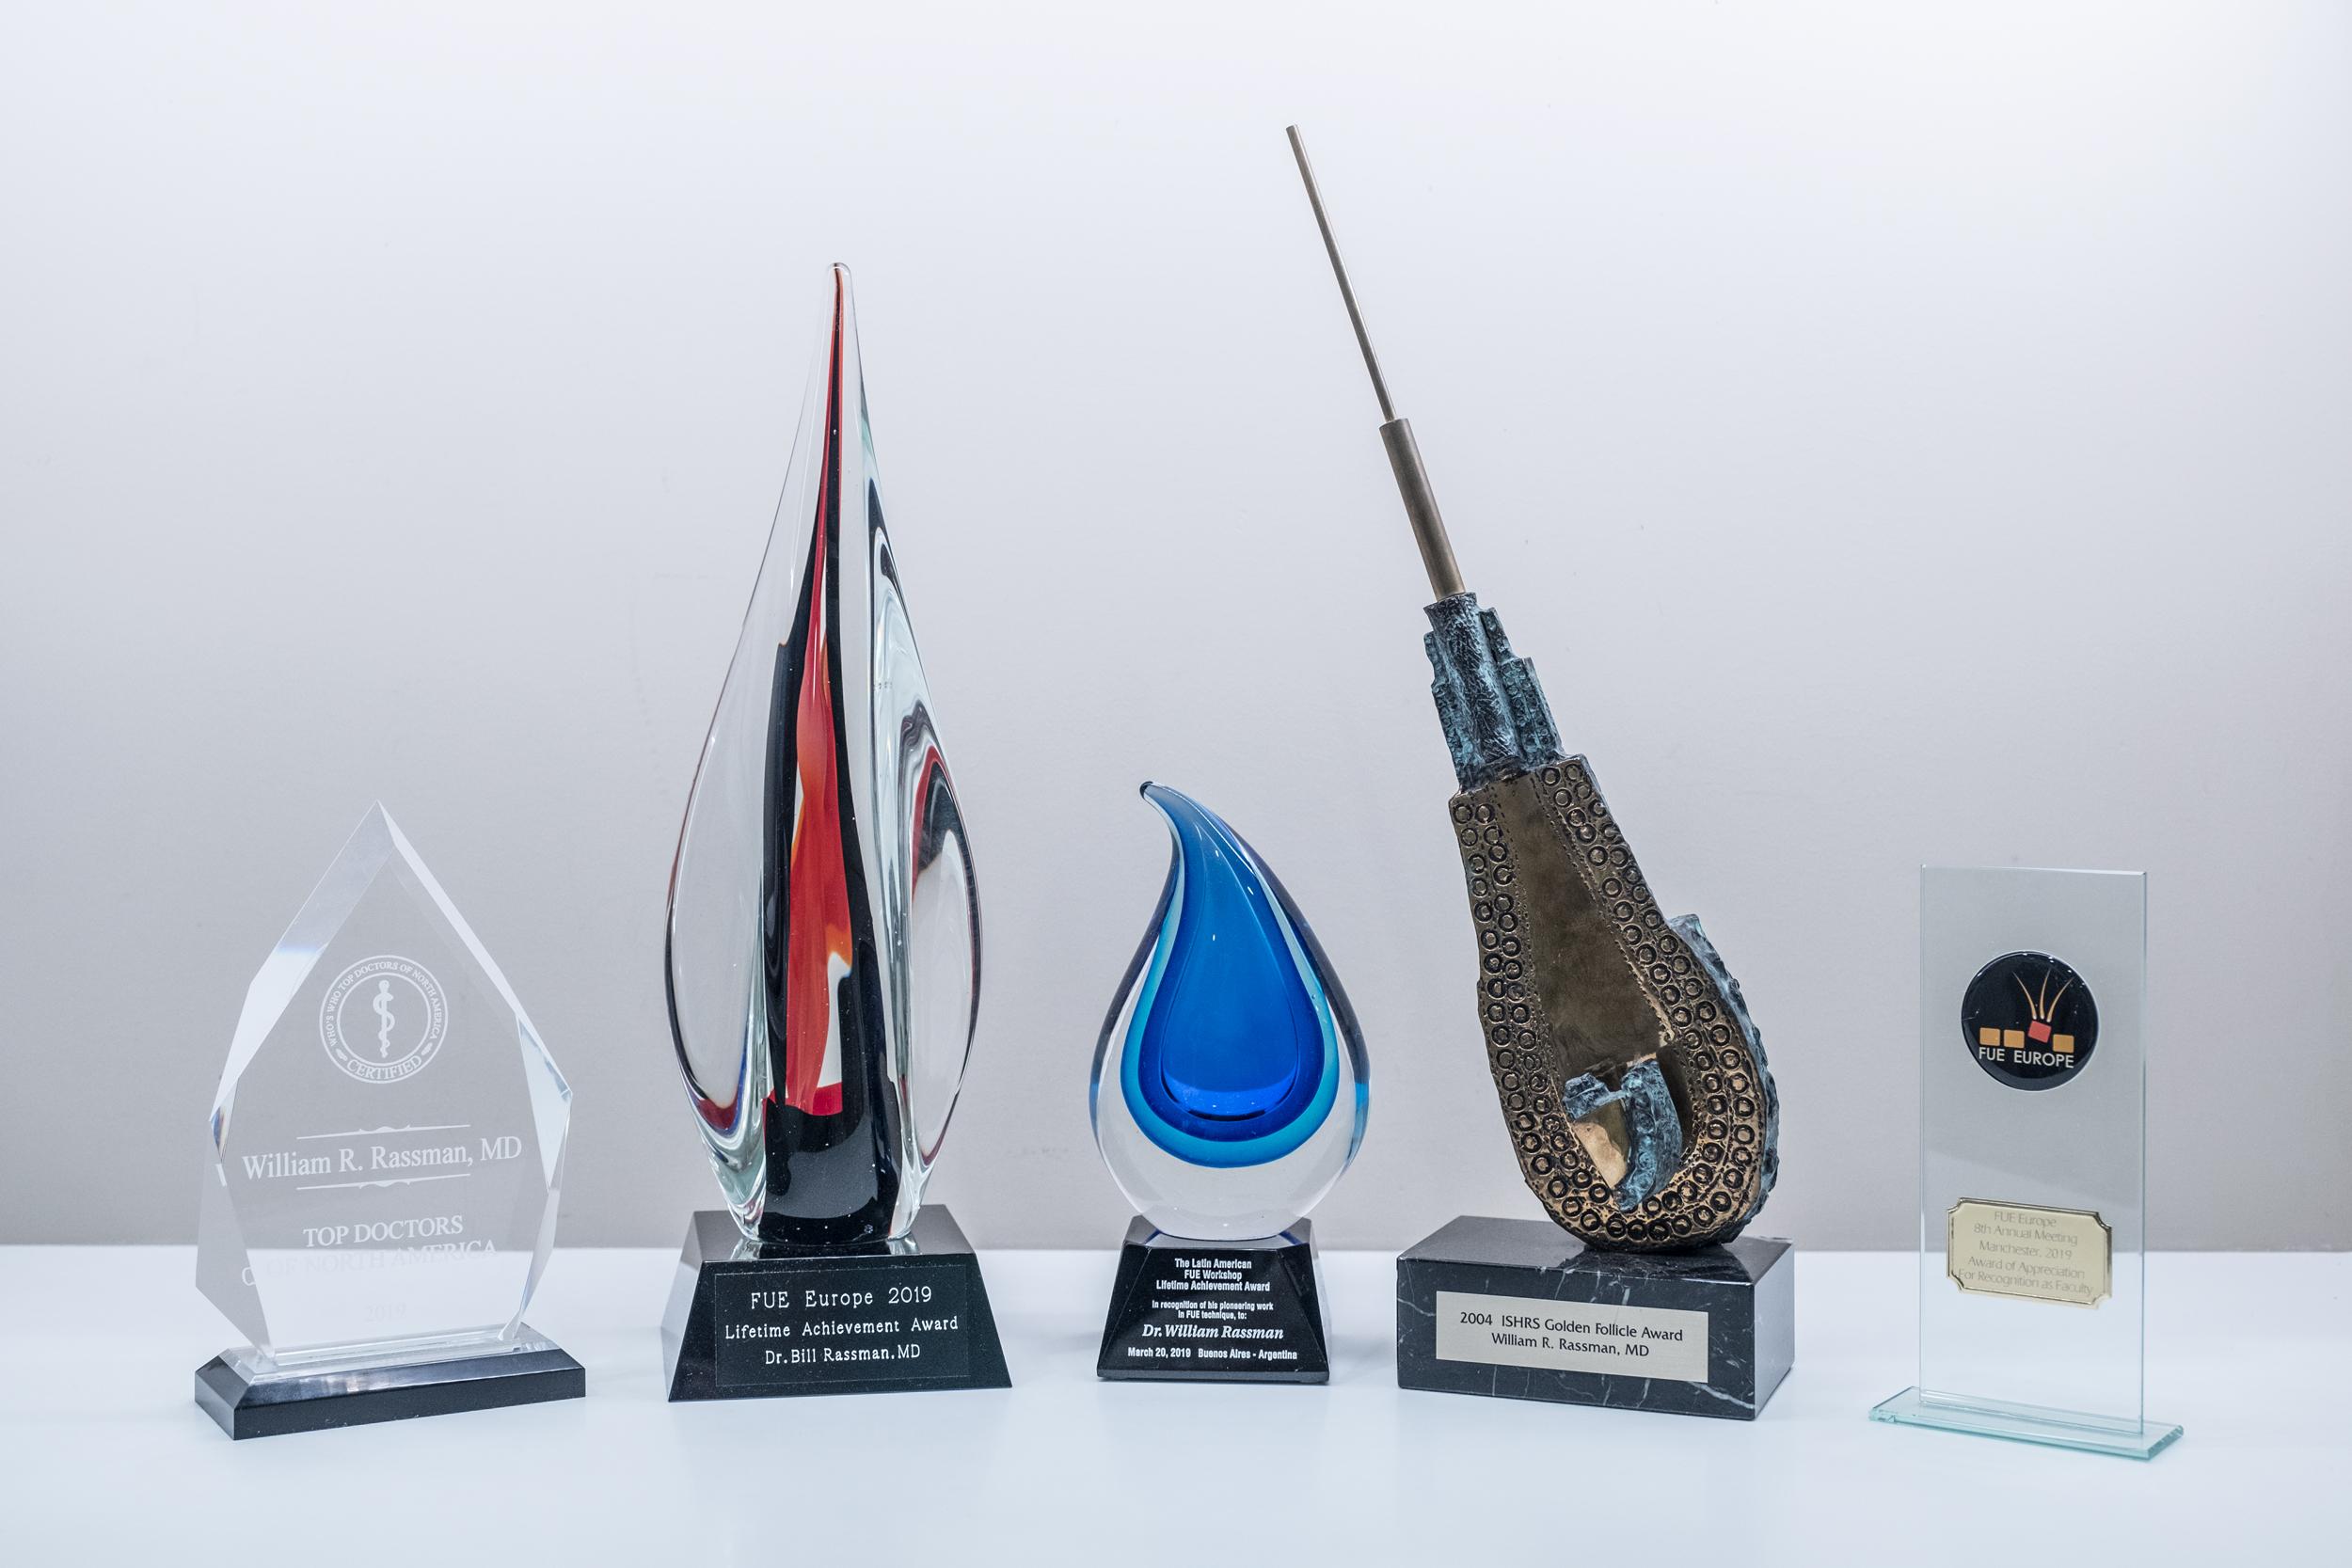 Hair Restoration Awards won by Dr. William Rassman